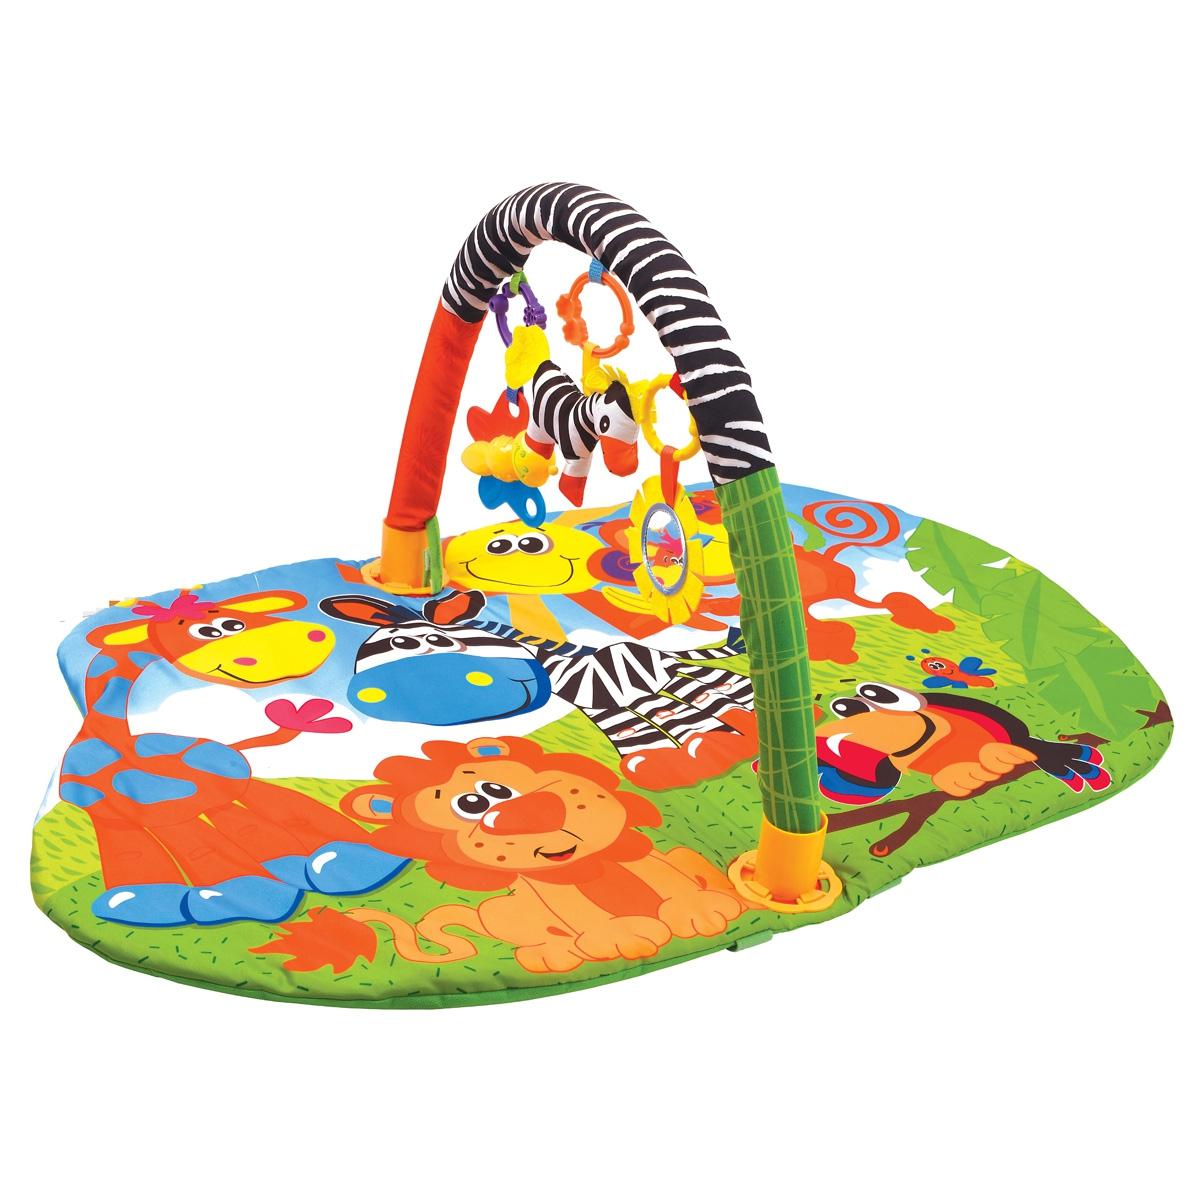 Купить Развивающий коврик, Веселый зоопарк, 1шт., Ути Пути 49388, Китай, Мультиколор